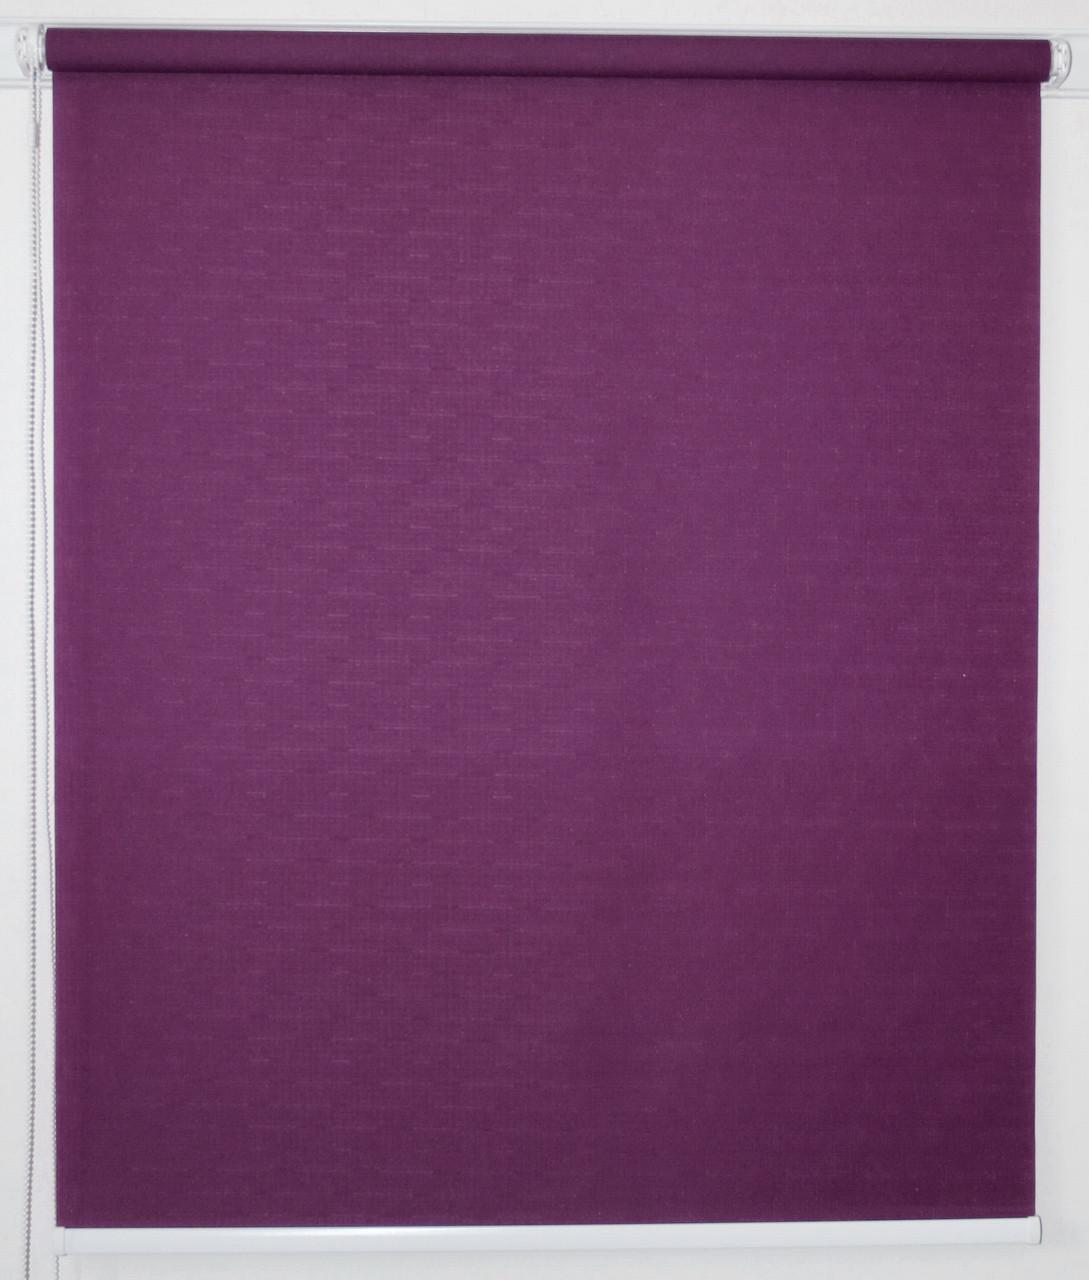 Рулонная штора 725*1500 Лён 613 Фиолетовый